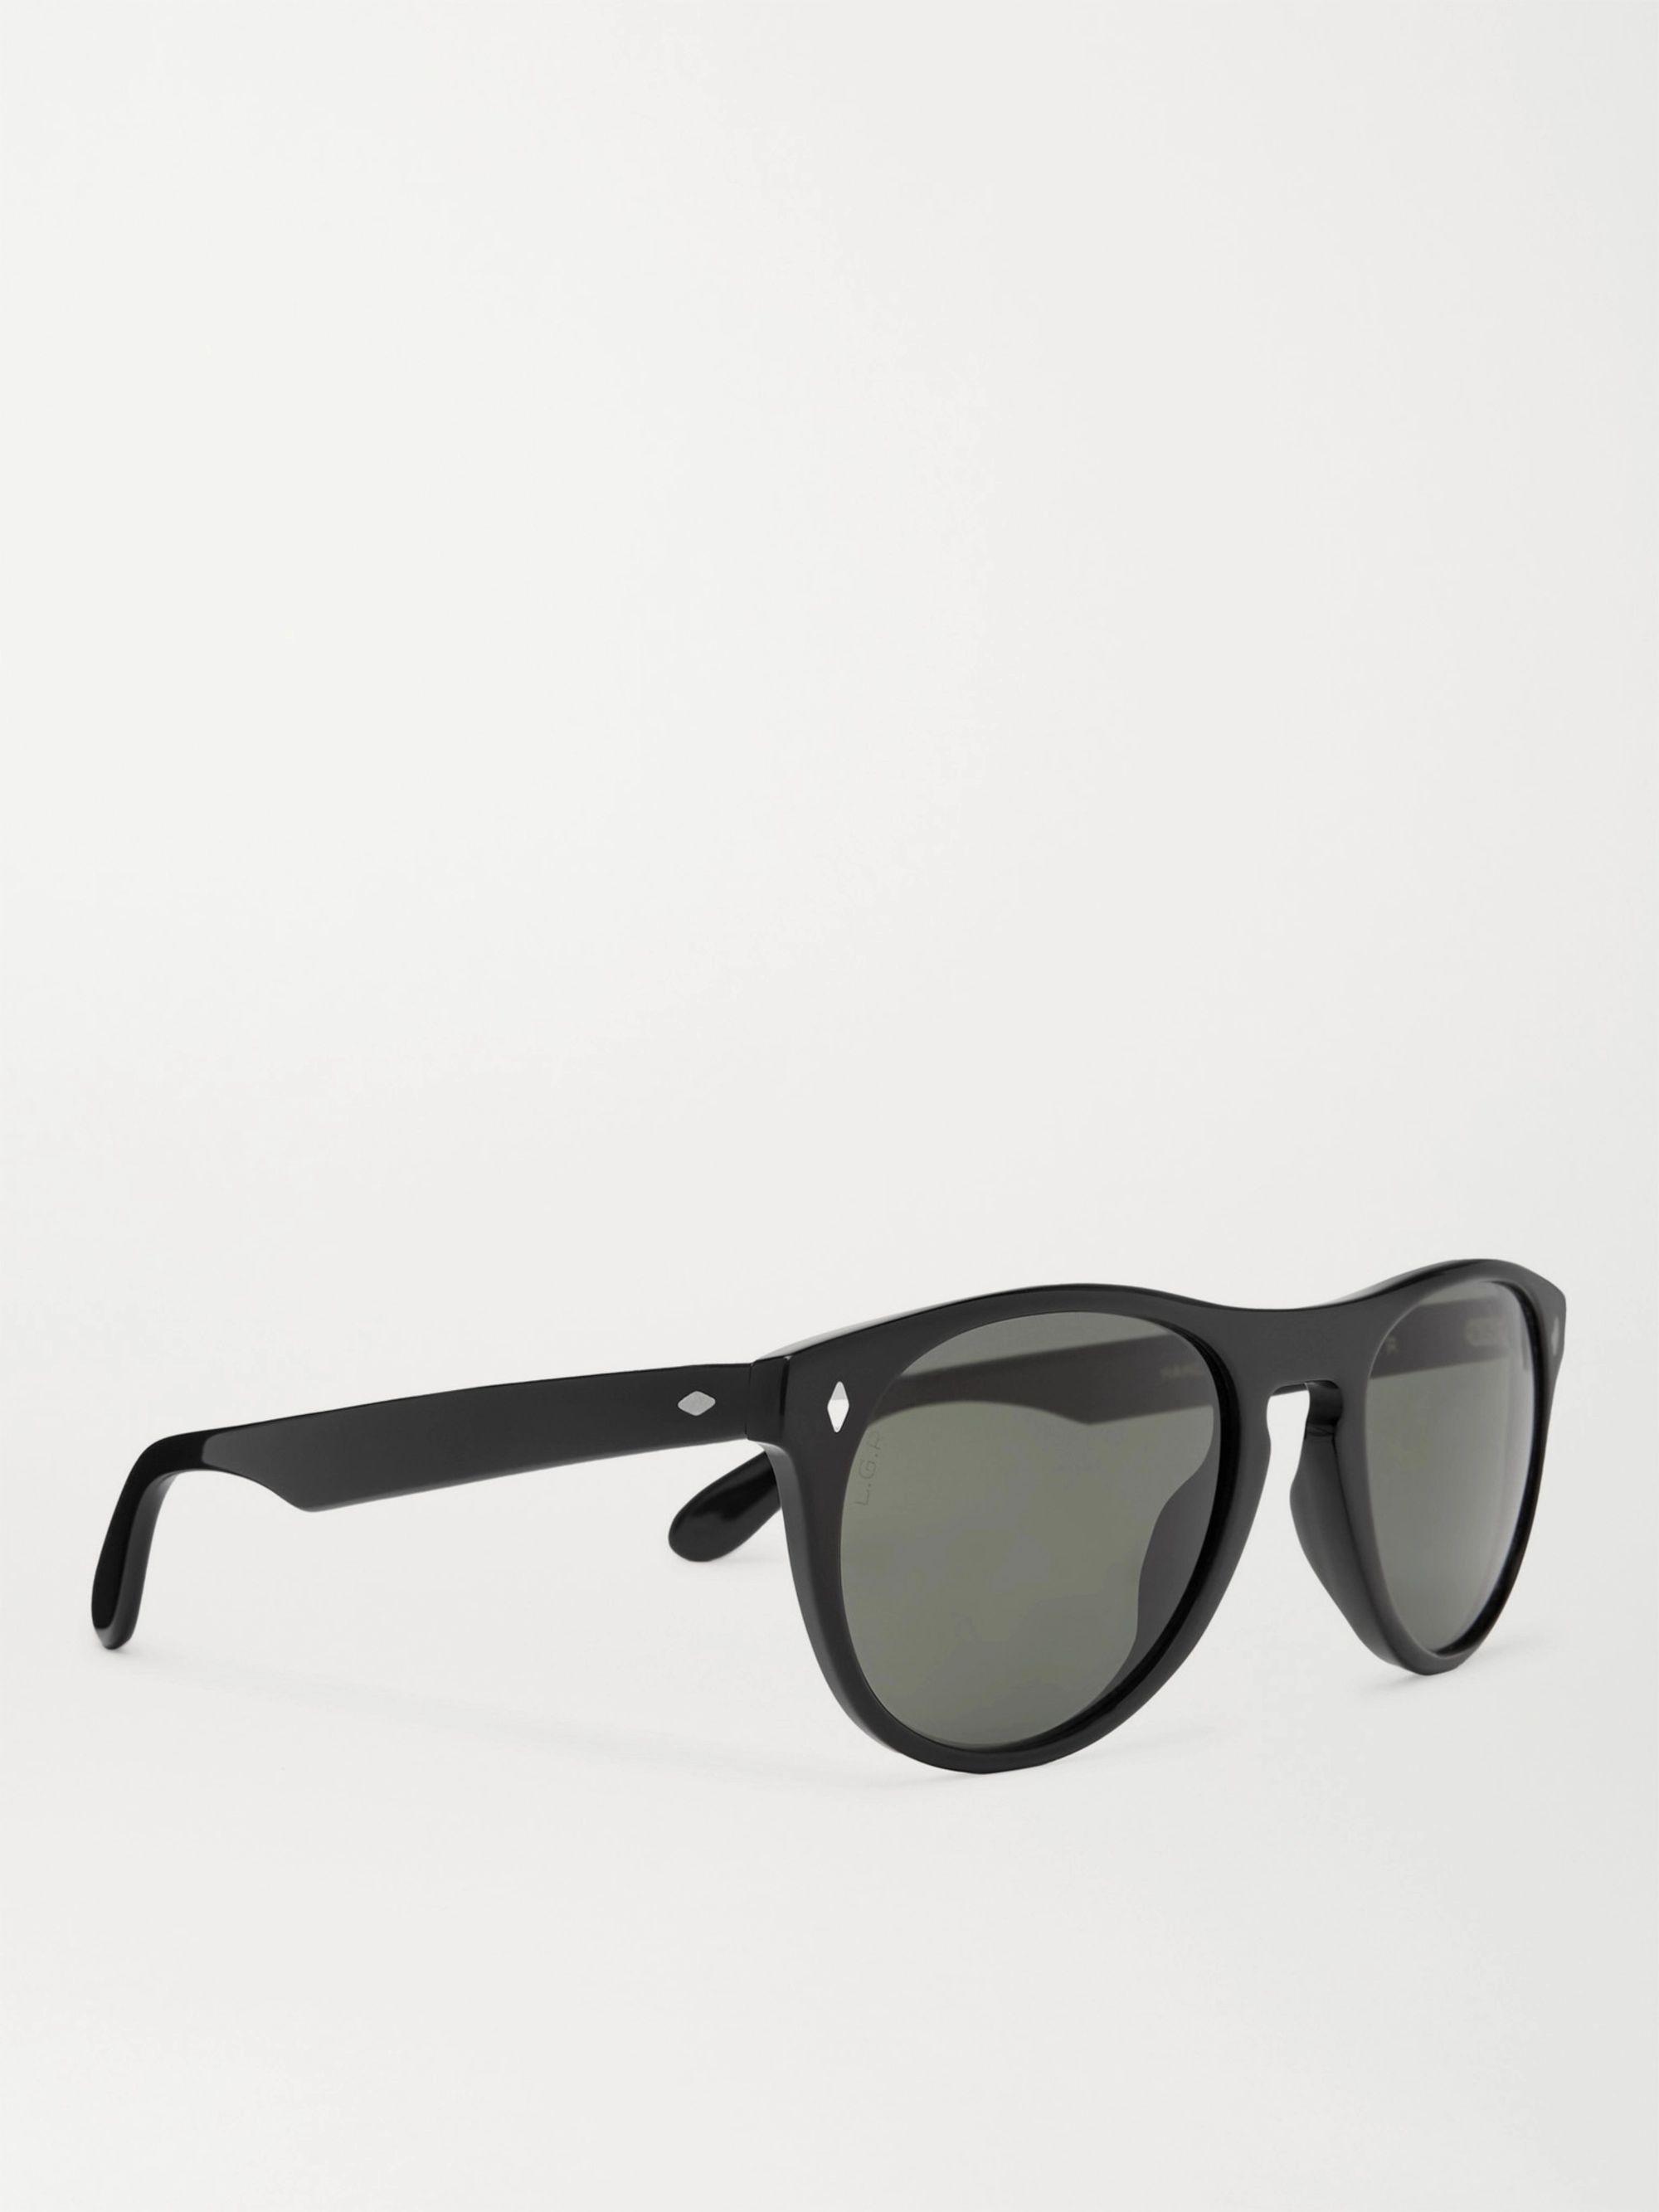 Black Abidjan Round-frame Acetate Sunglasses   L.g.r